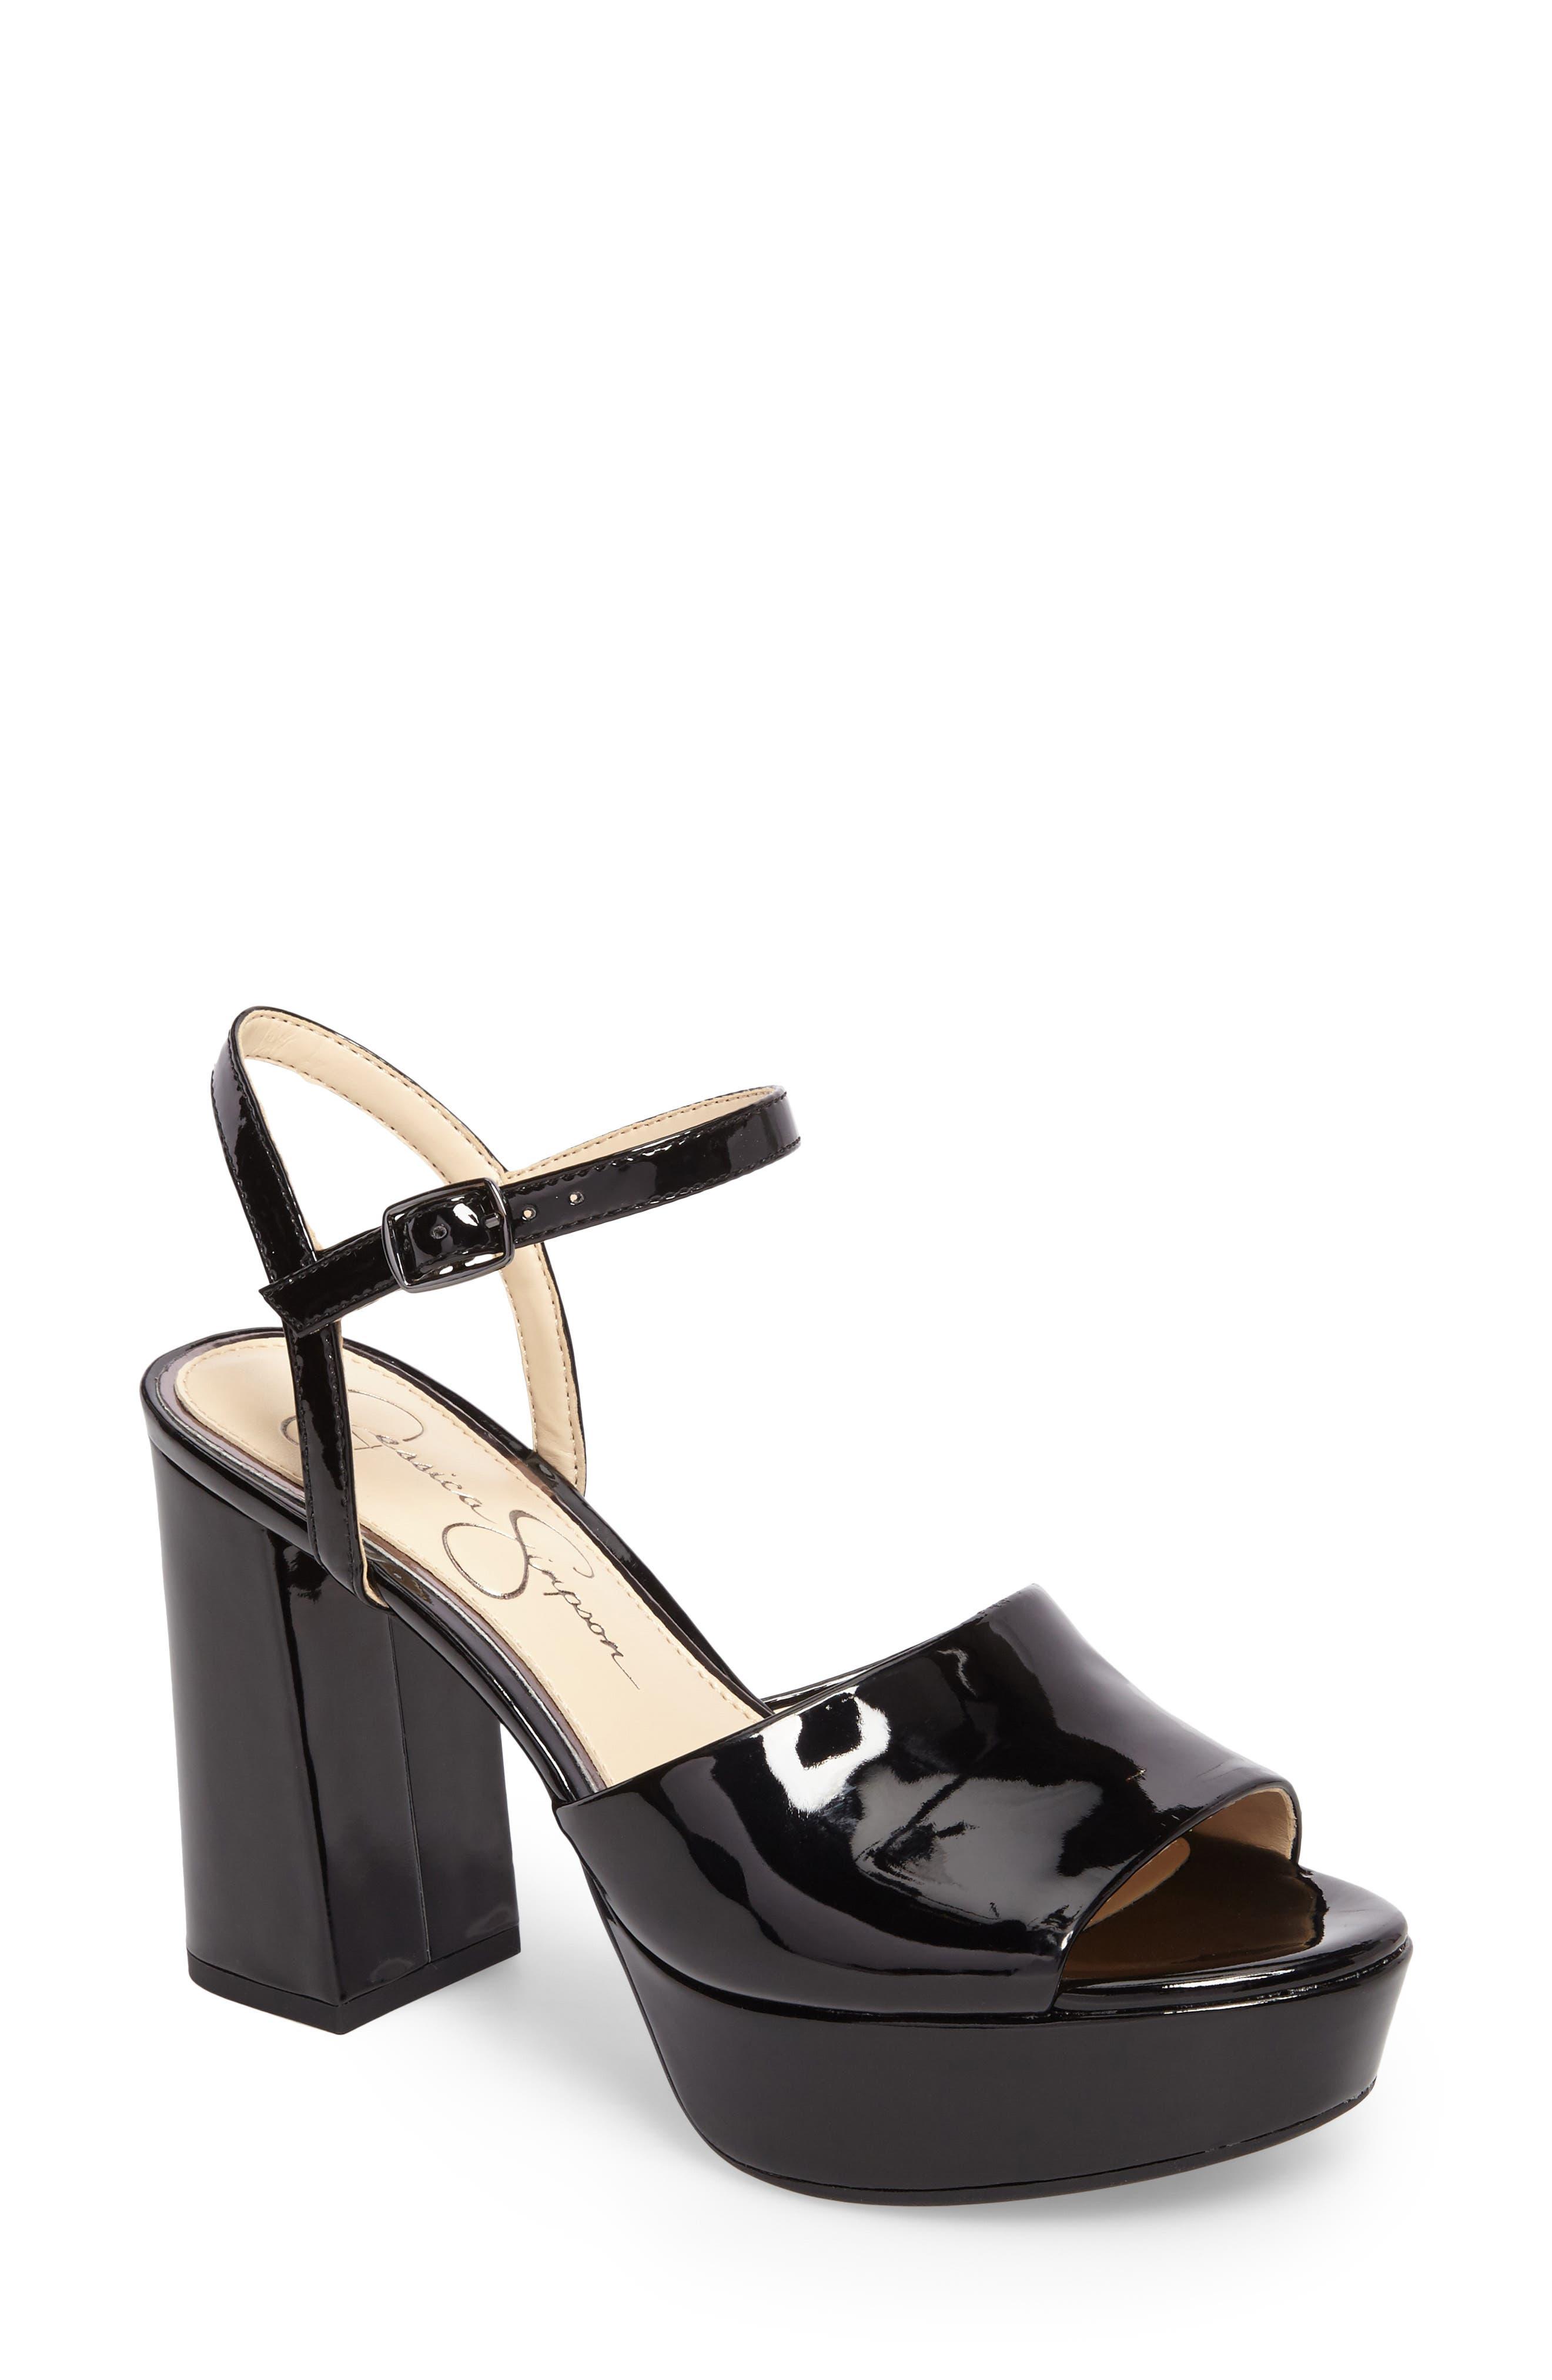 Kerrick Platform Sandal,                             Main thumbnail 1, color,                             001